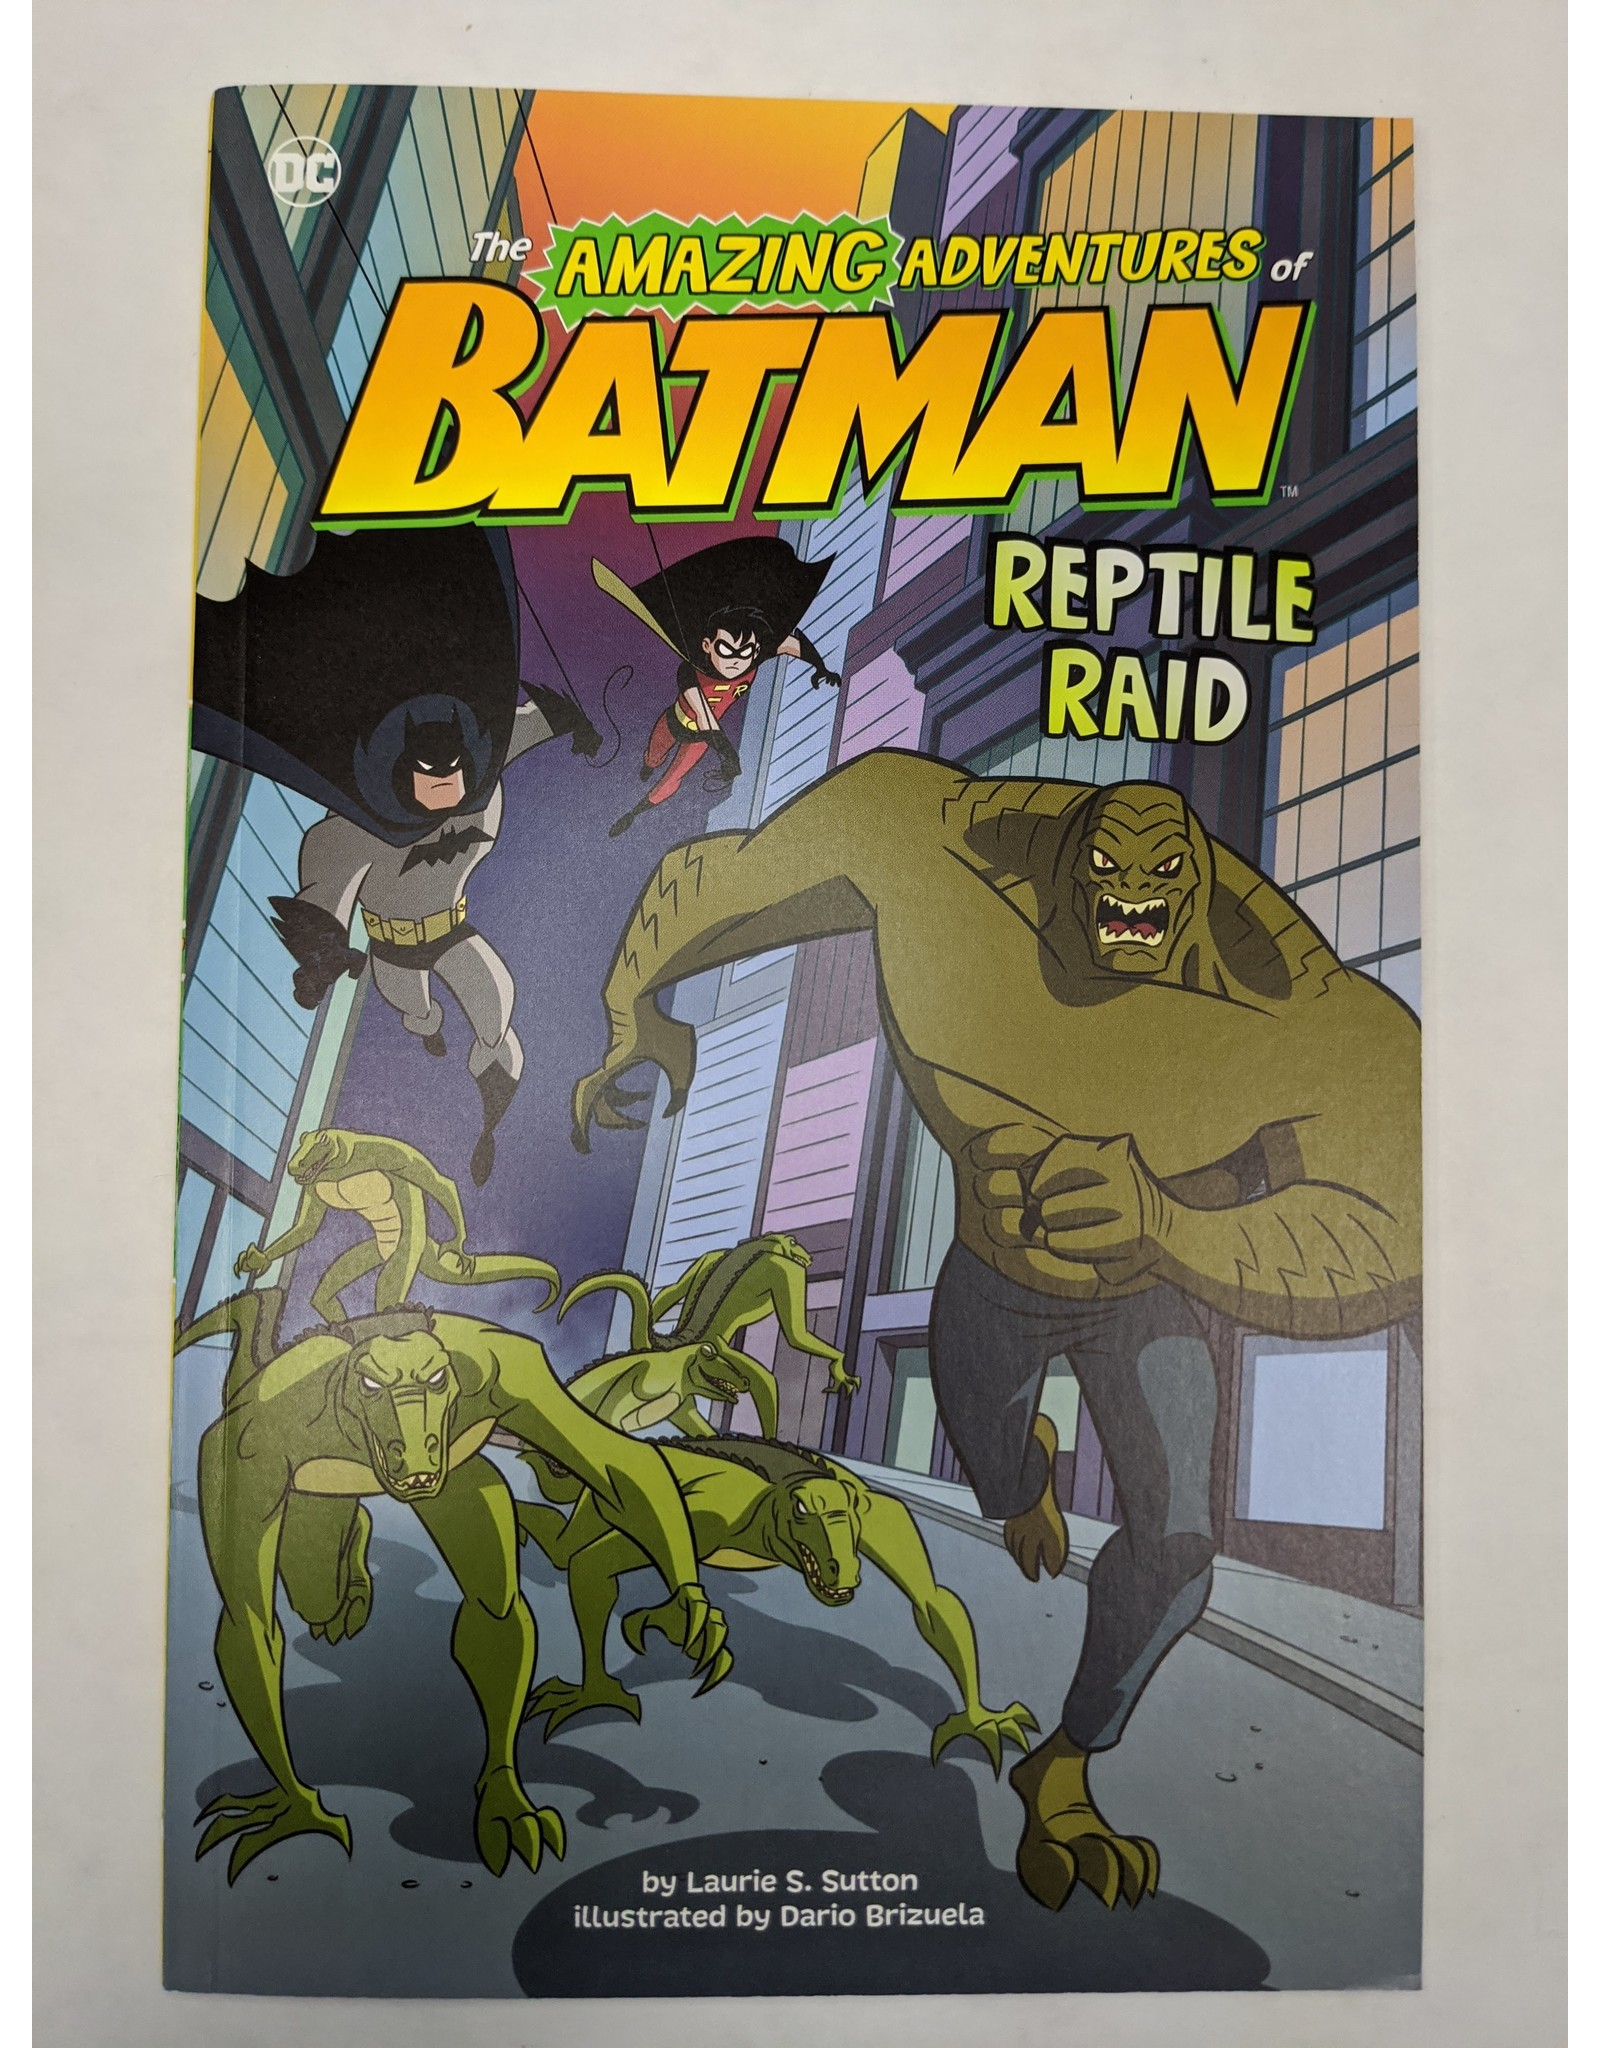 STONE ARCH BOOKS DC AMAZING ADV OF BATMAN YR SC REPTILE RAID